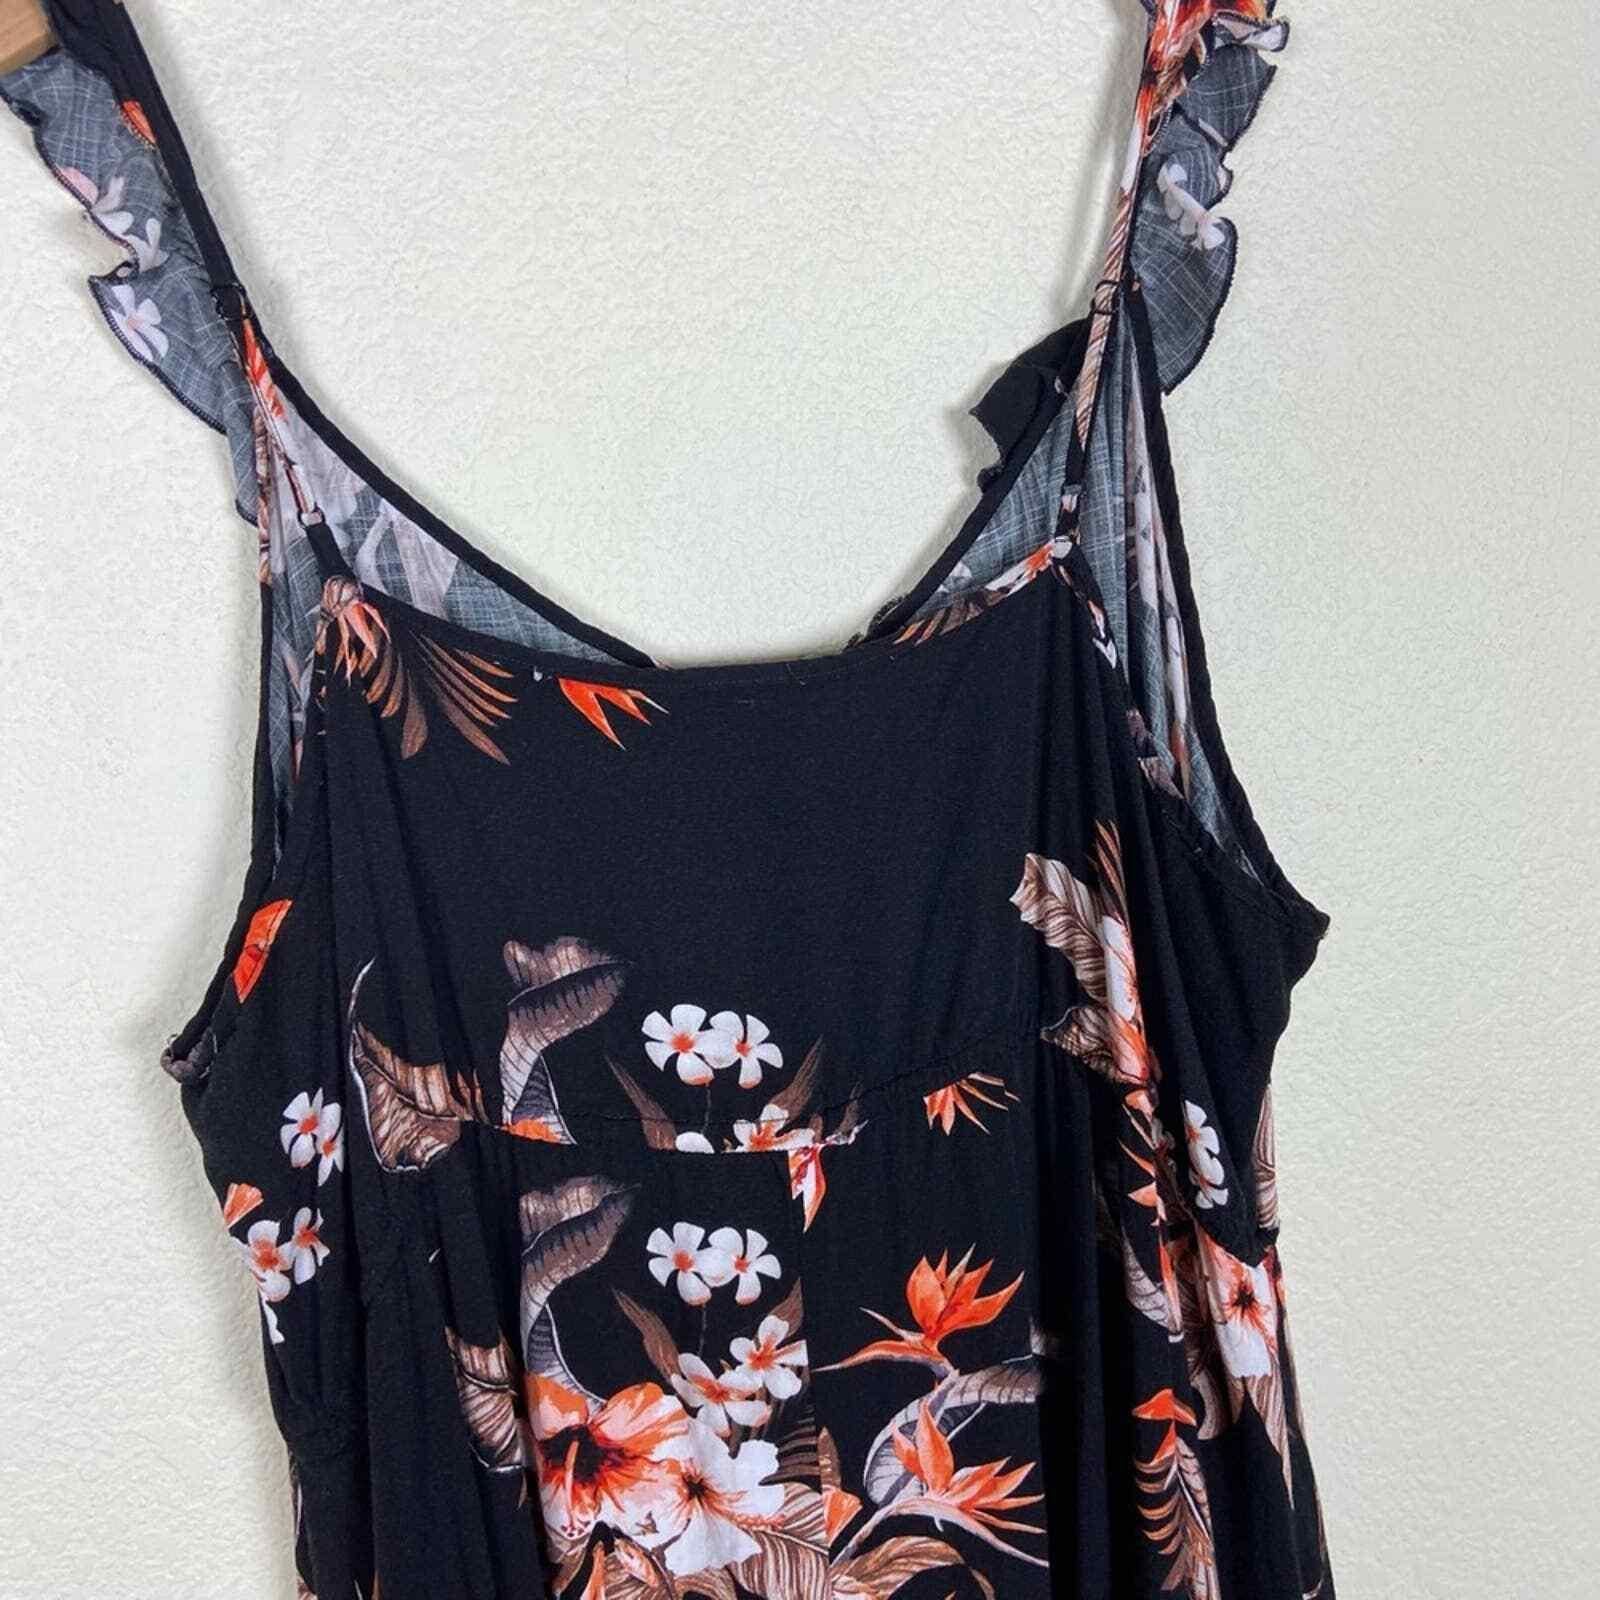 City Chic Seville Black Floral Swing Midi Dress - image 8